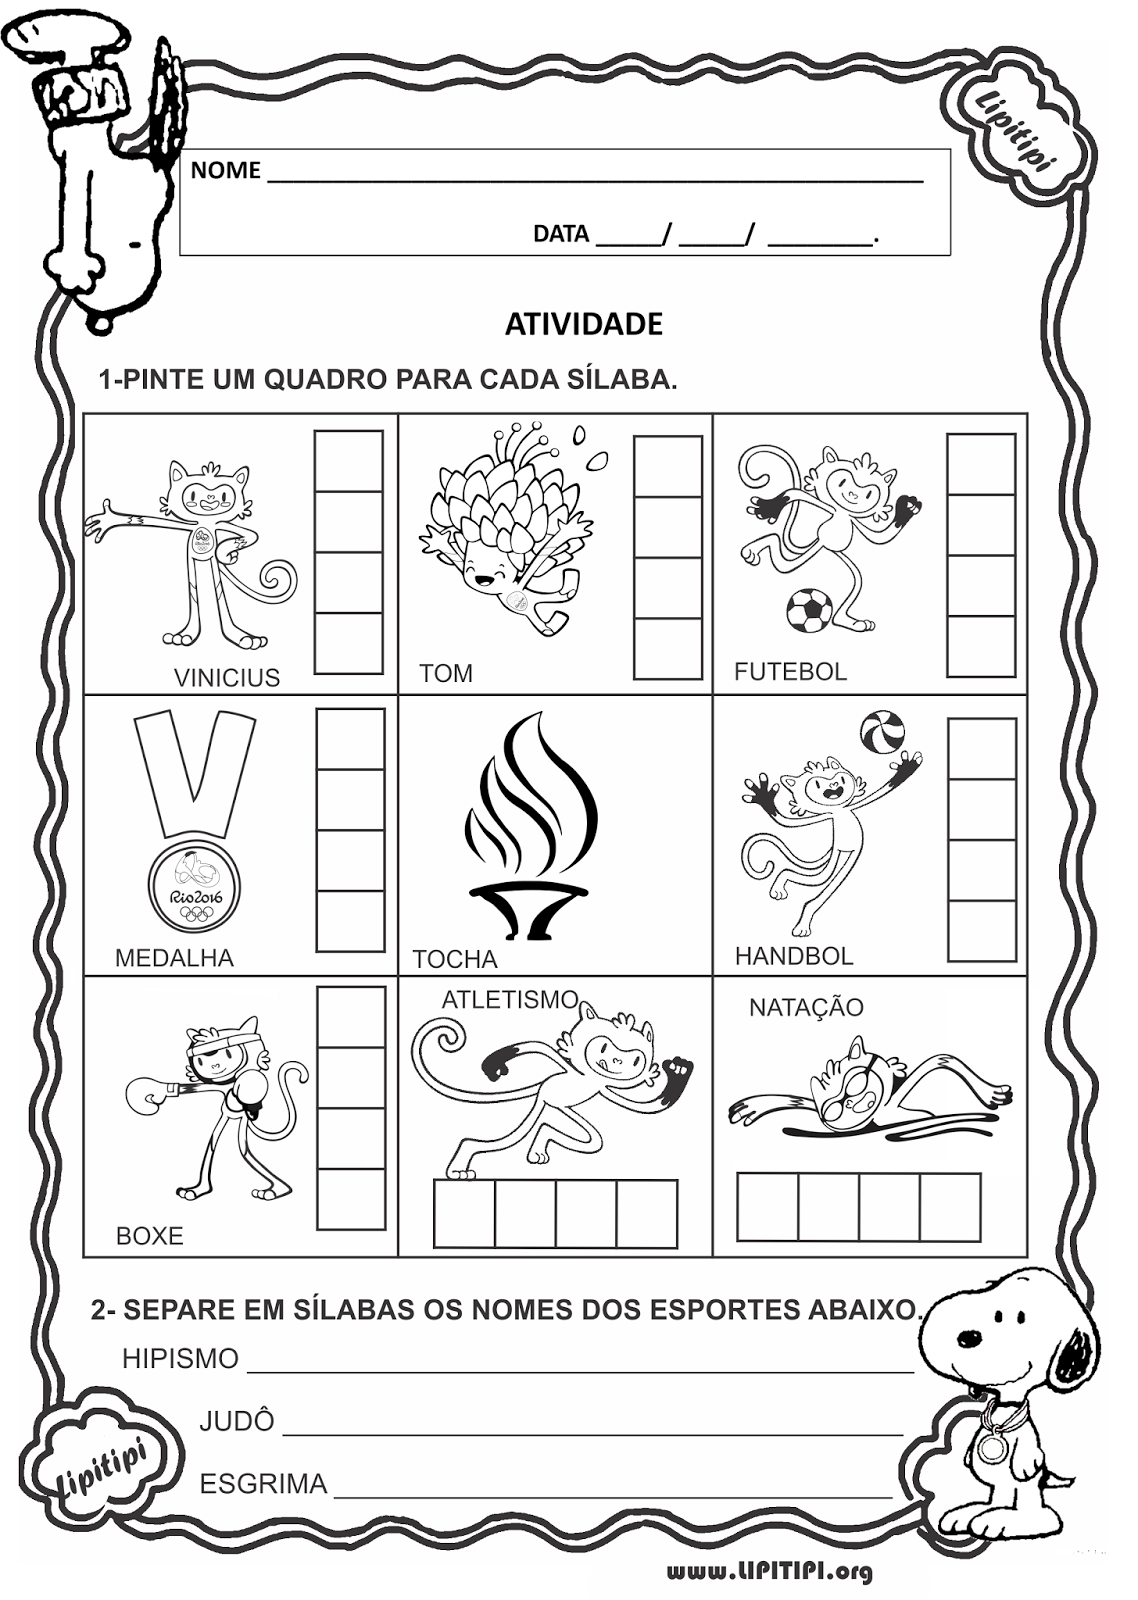 30 atividades olimpÍadas rio 2016 exercÍcios colorir pintar imprimir